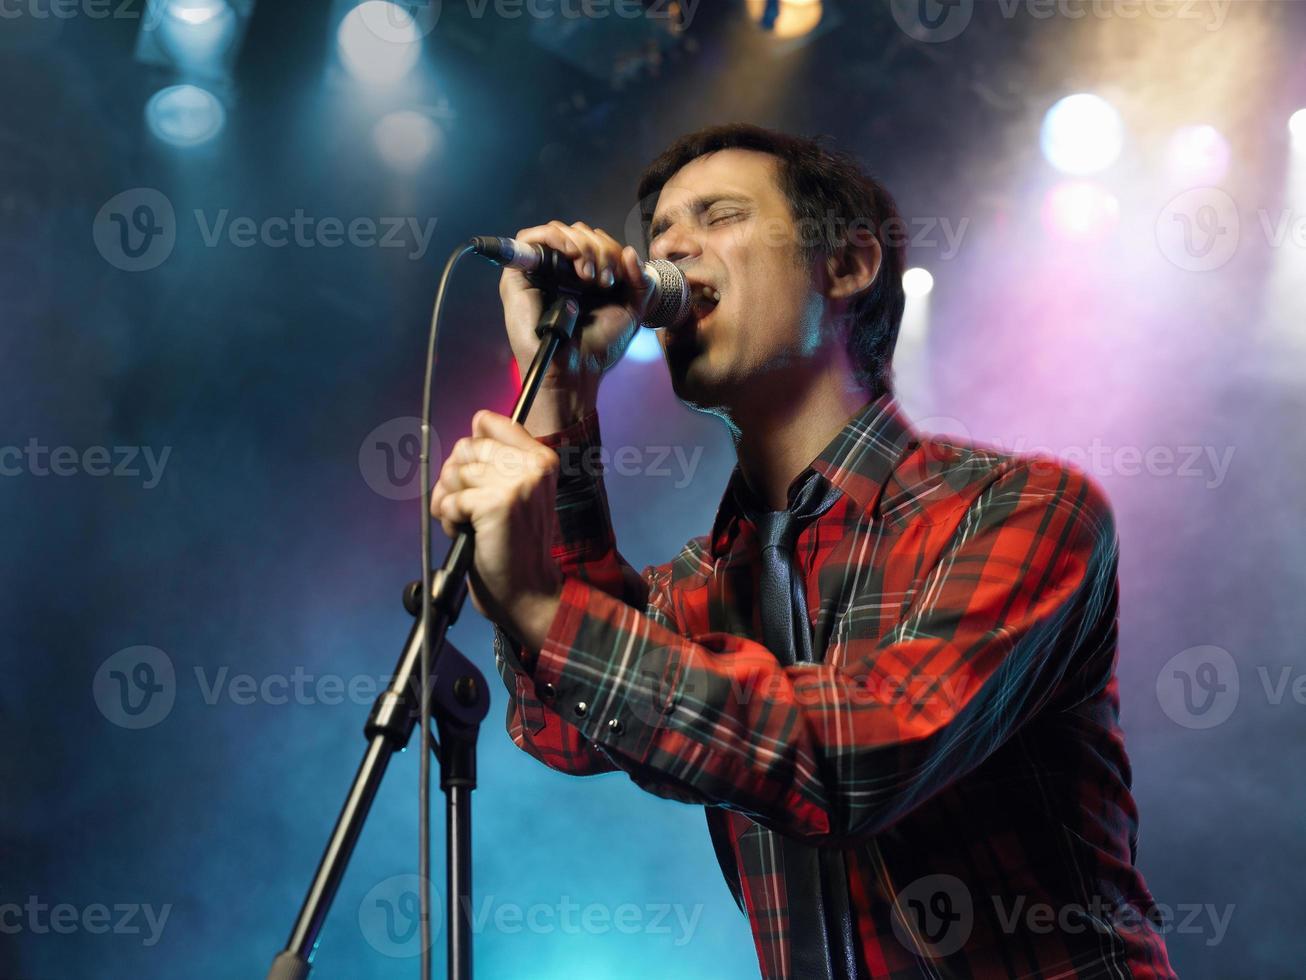 jonge man zingen in de microfoon foto